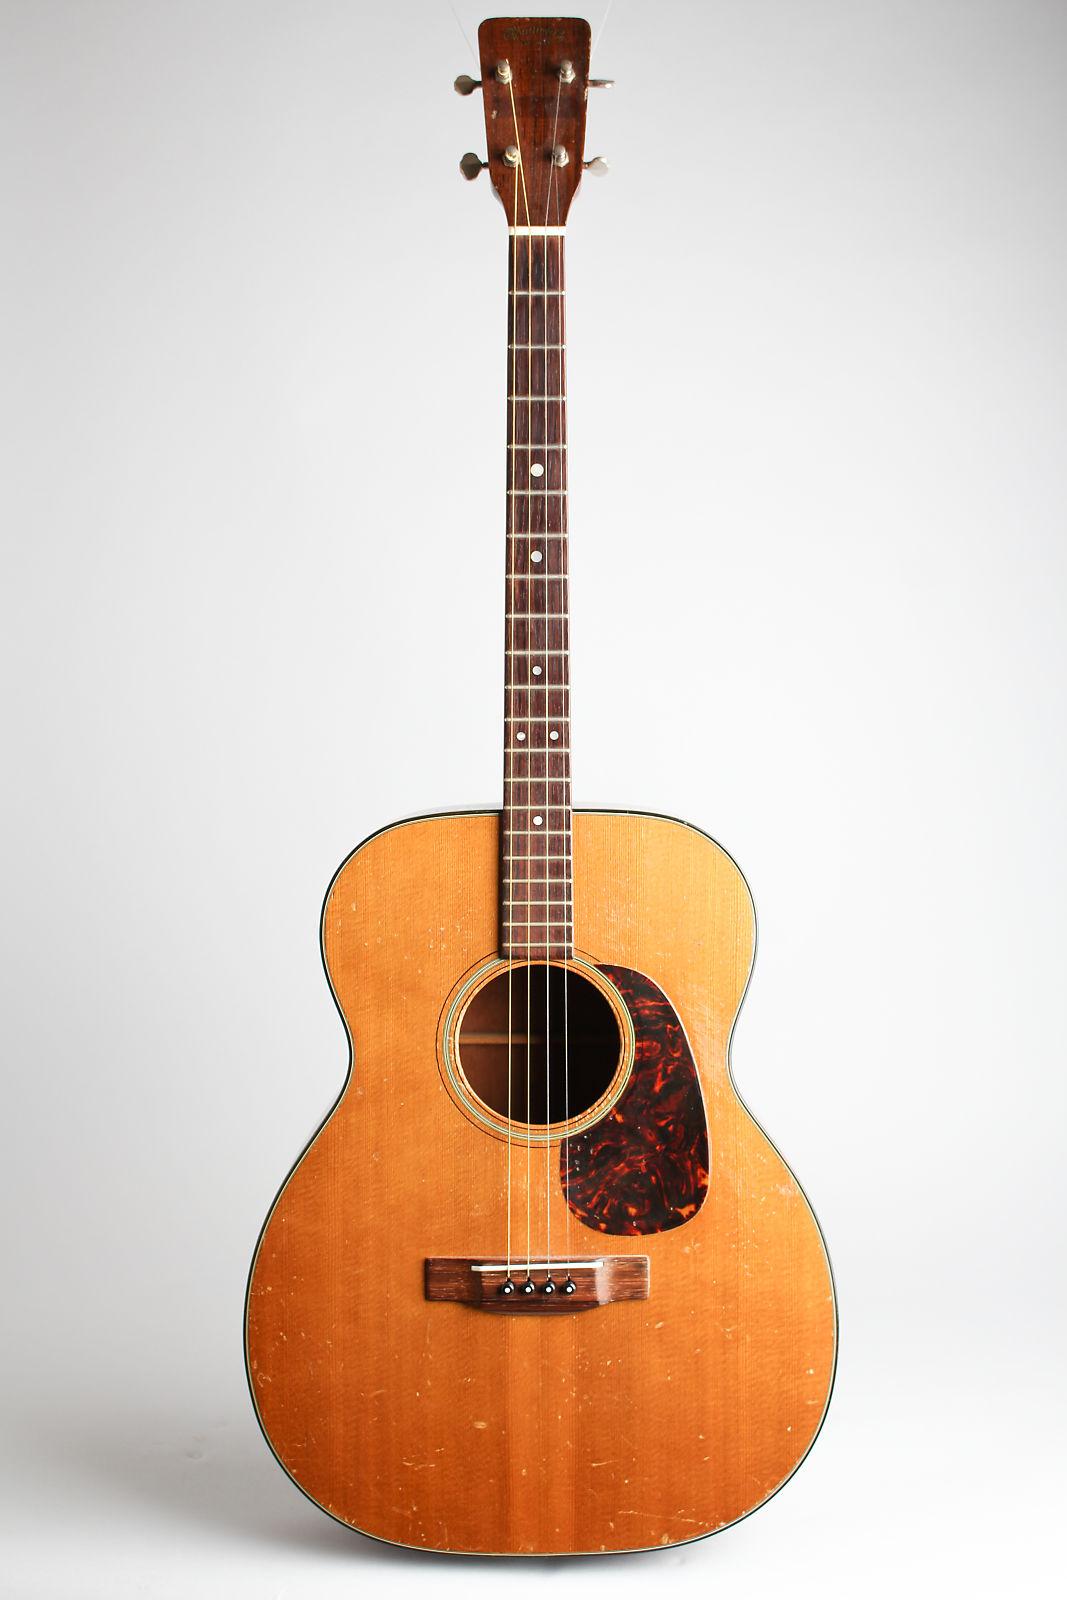 C. F. Martin  0-18T Flat Top Tenor Guitar (1962), ser. #181614, black chipboard case.